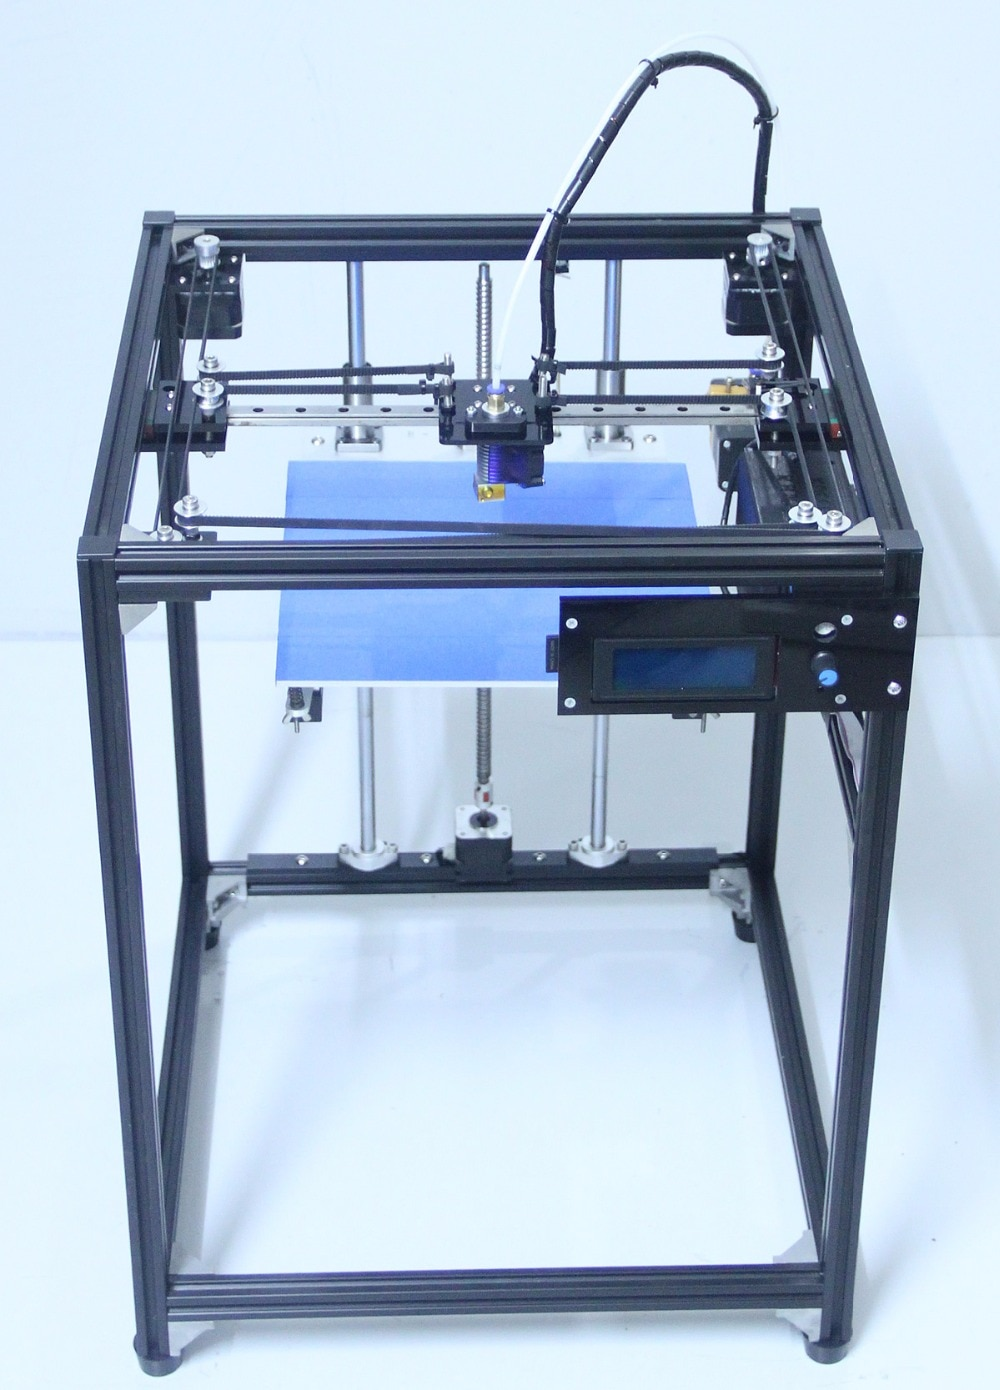 Ifancybox3 solo tamaño grande máquina de impresora 3D rampas negro corexy Kit completo kit de impresora 3d